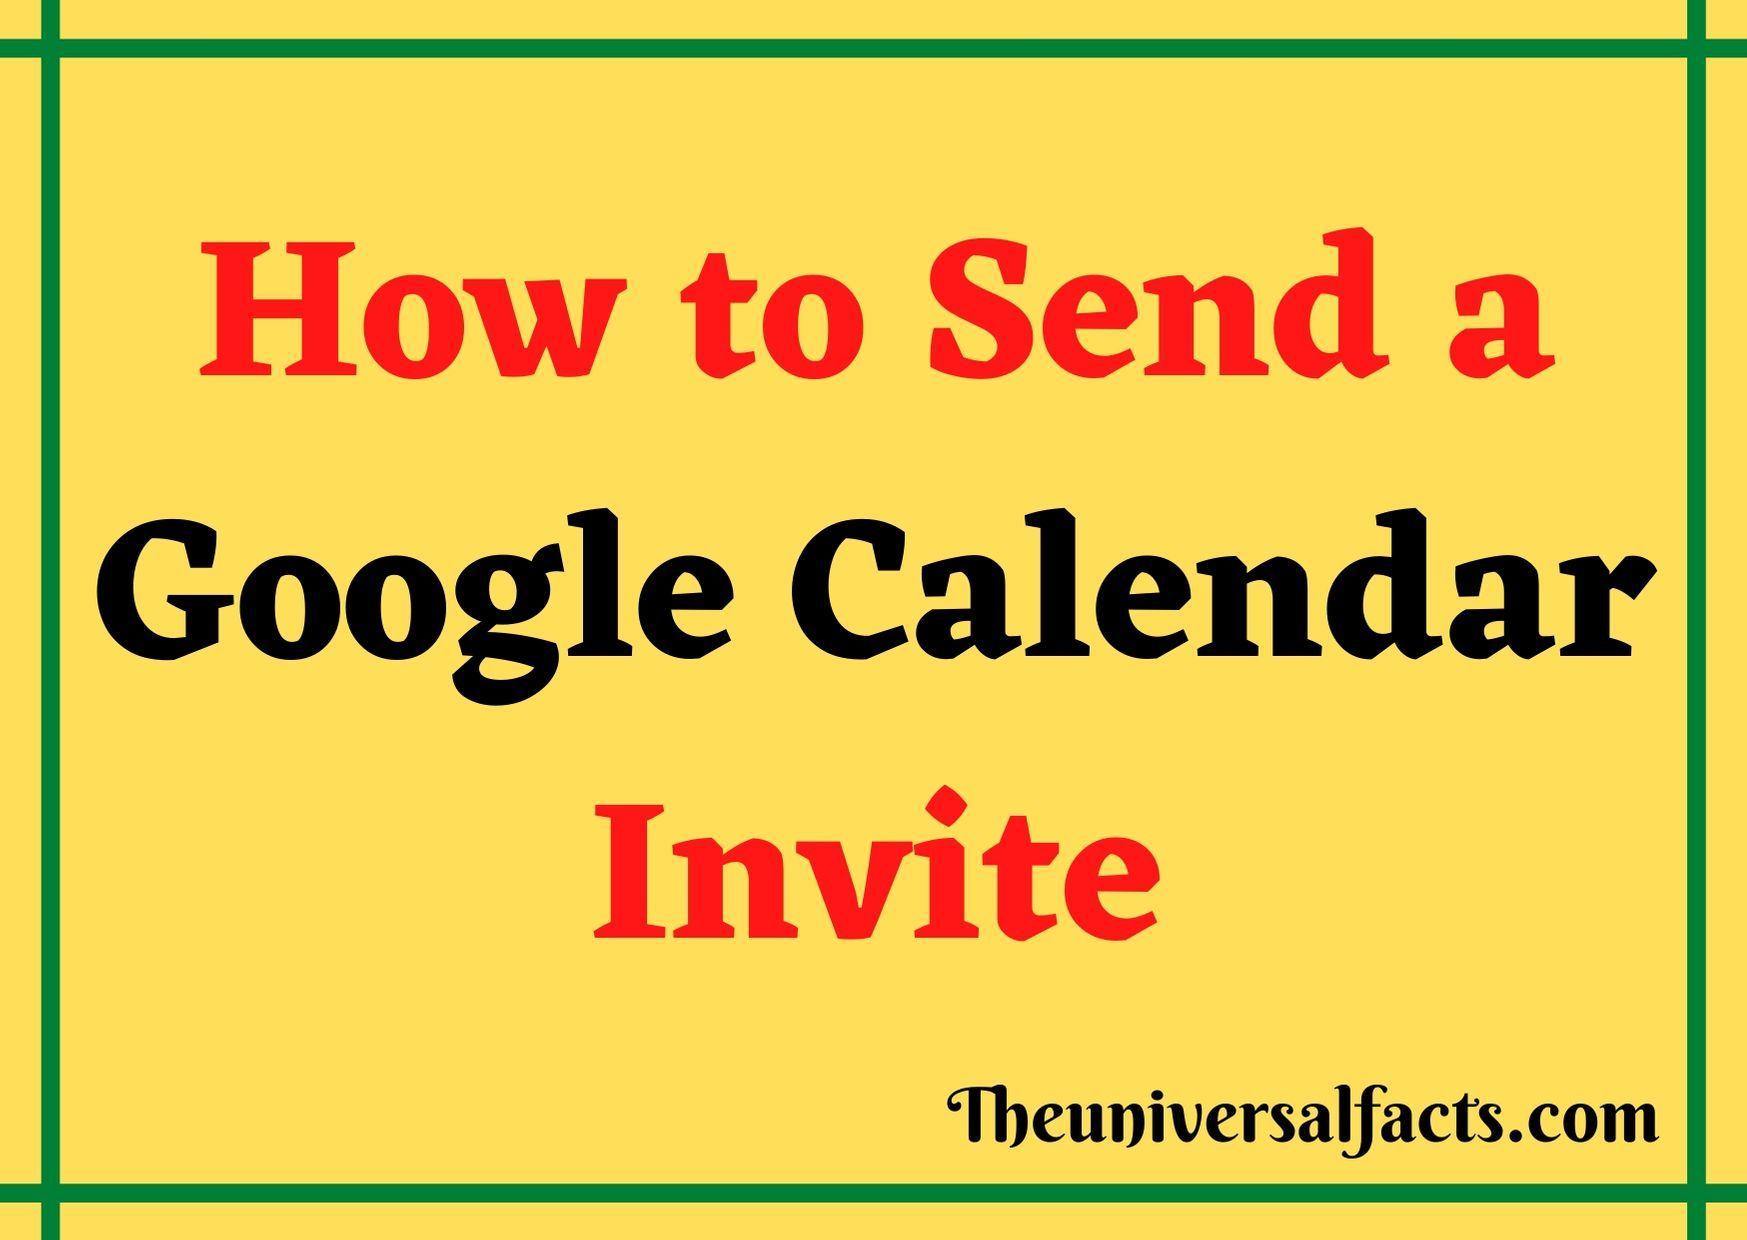 How To Send A Google Calendar Invite You Can Do This Very Quickly Through Google Calendar This Tool Will Send A Noti In 2020 Calendar Invite Google Calendar Calendar